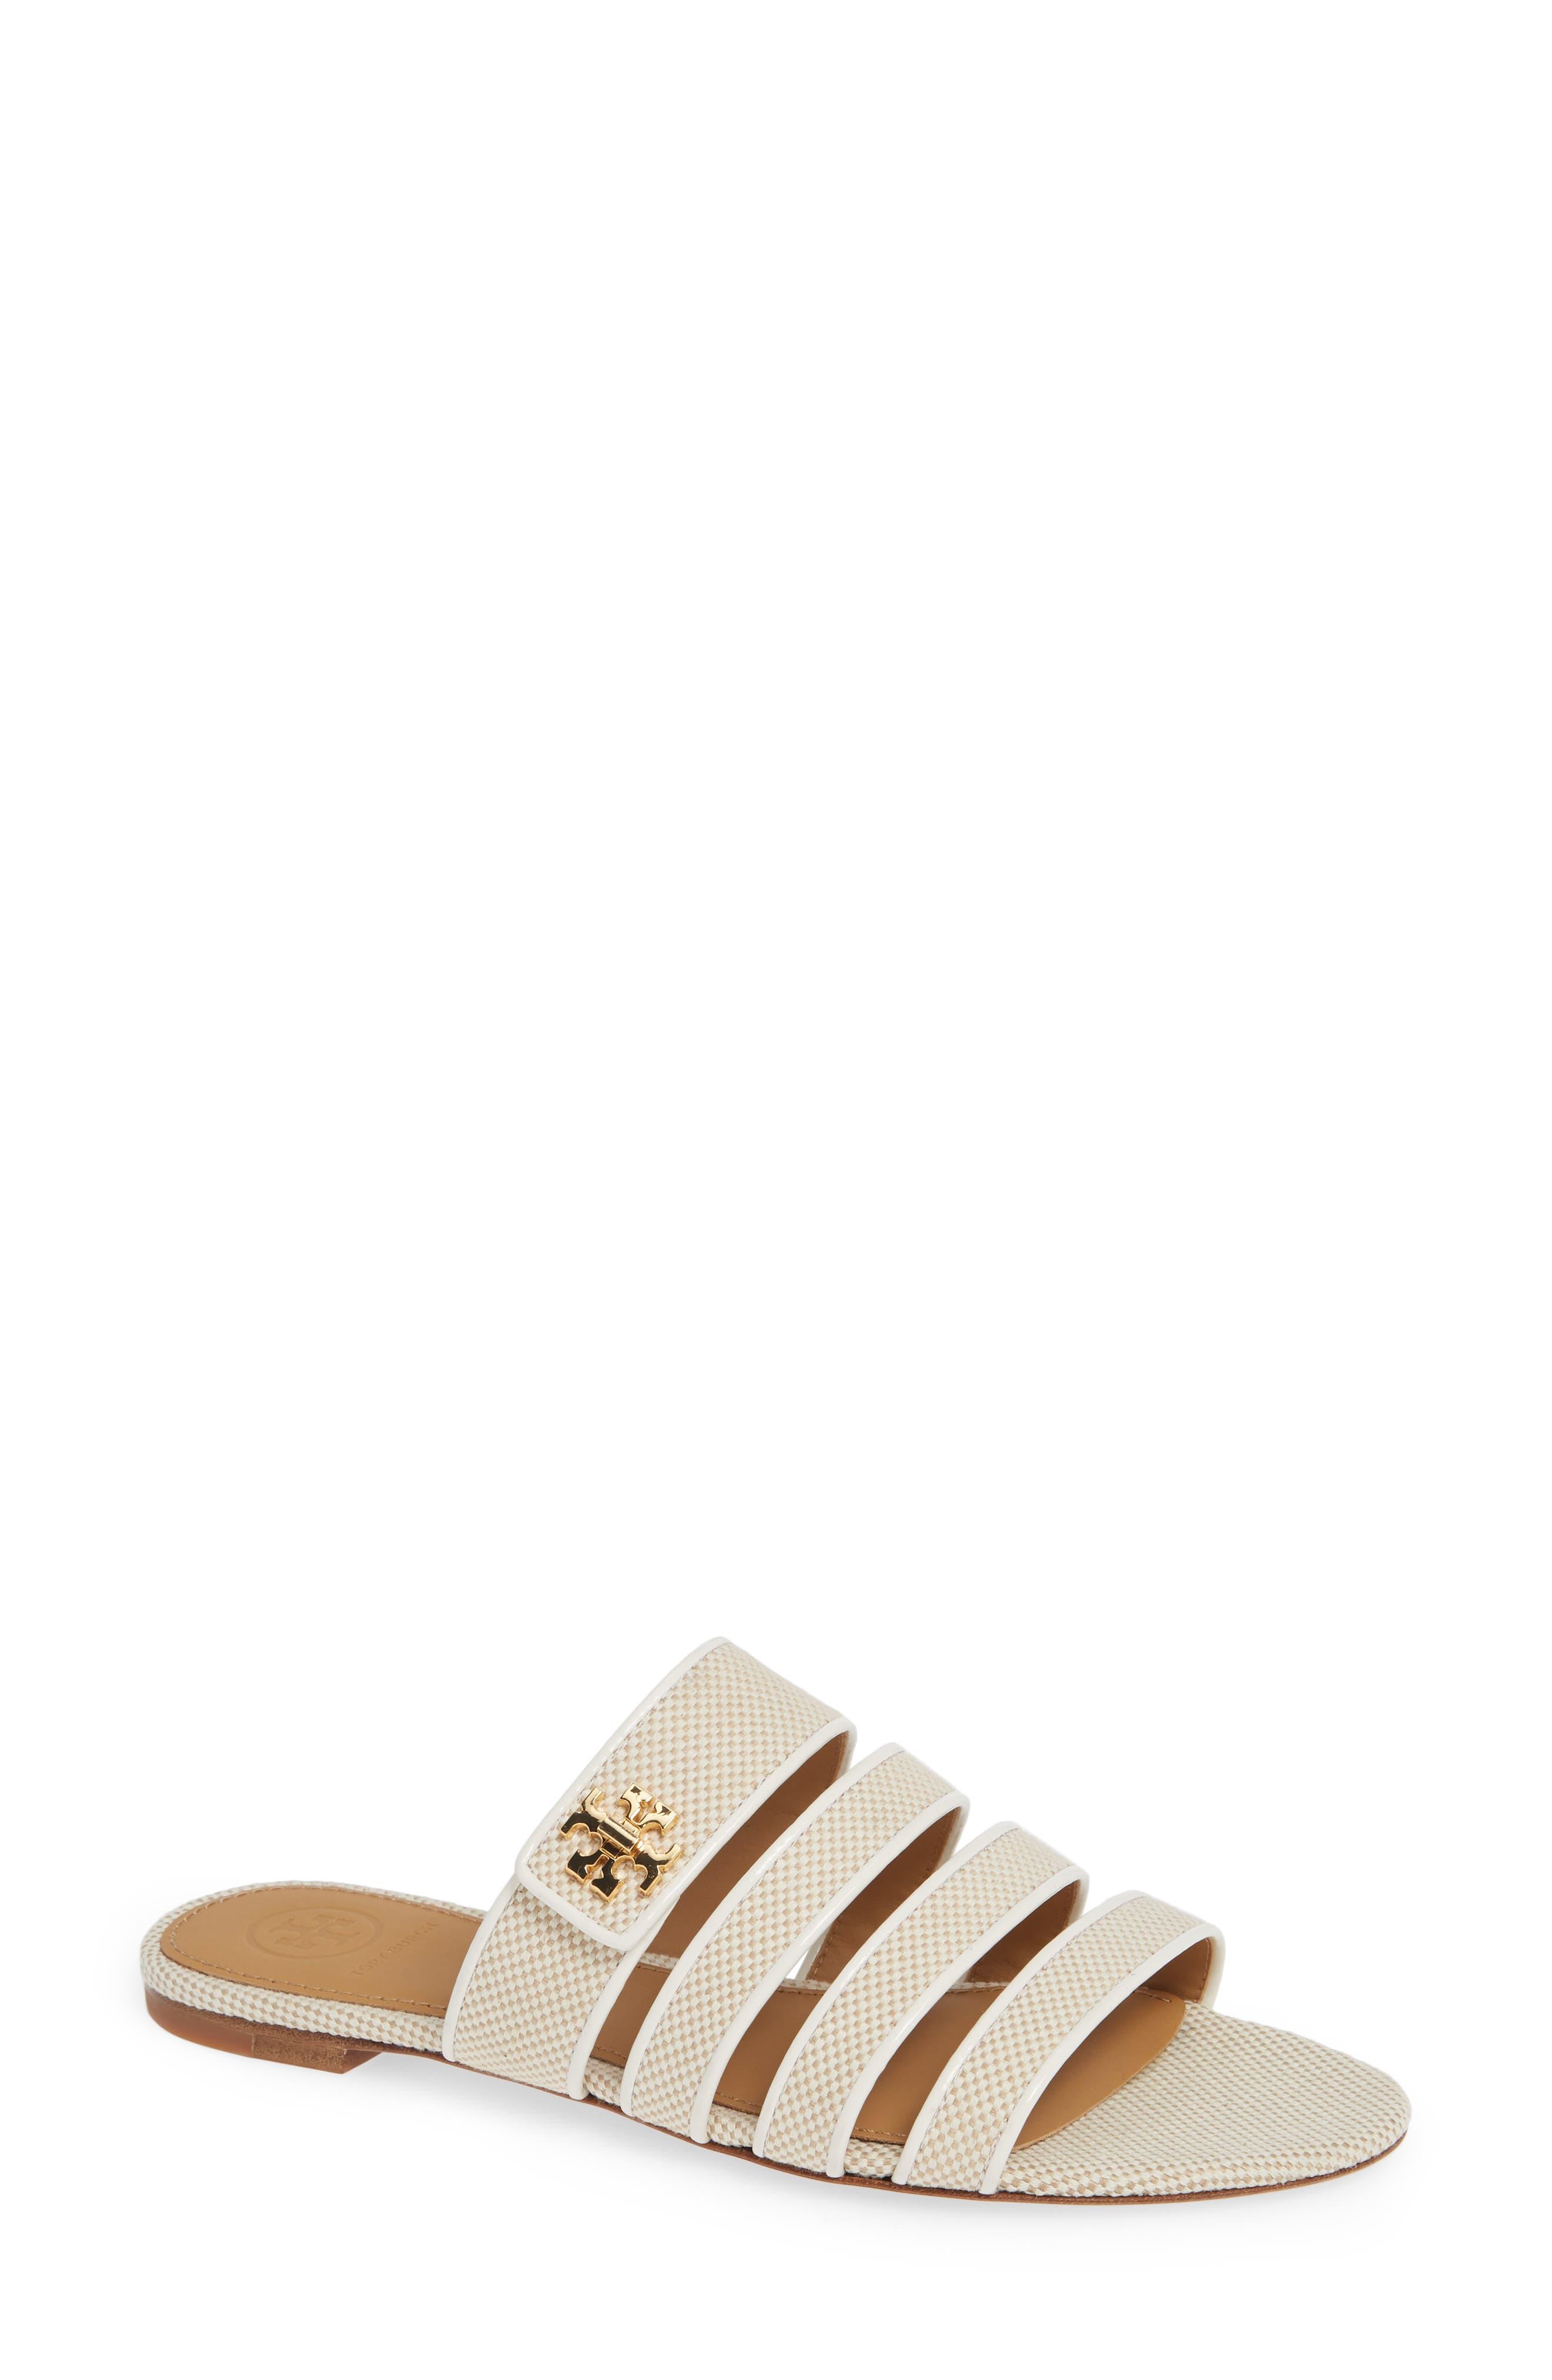 Tory Burch Kira Strappy Slide Sandal, Beige